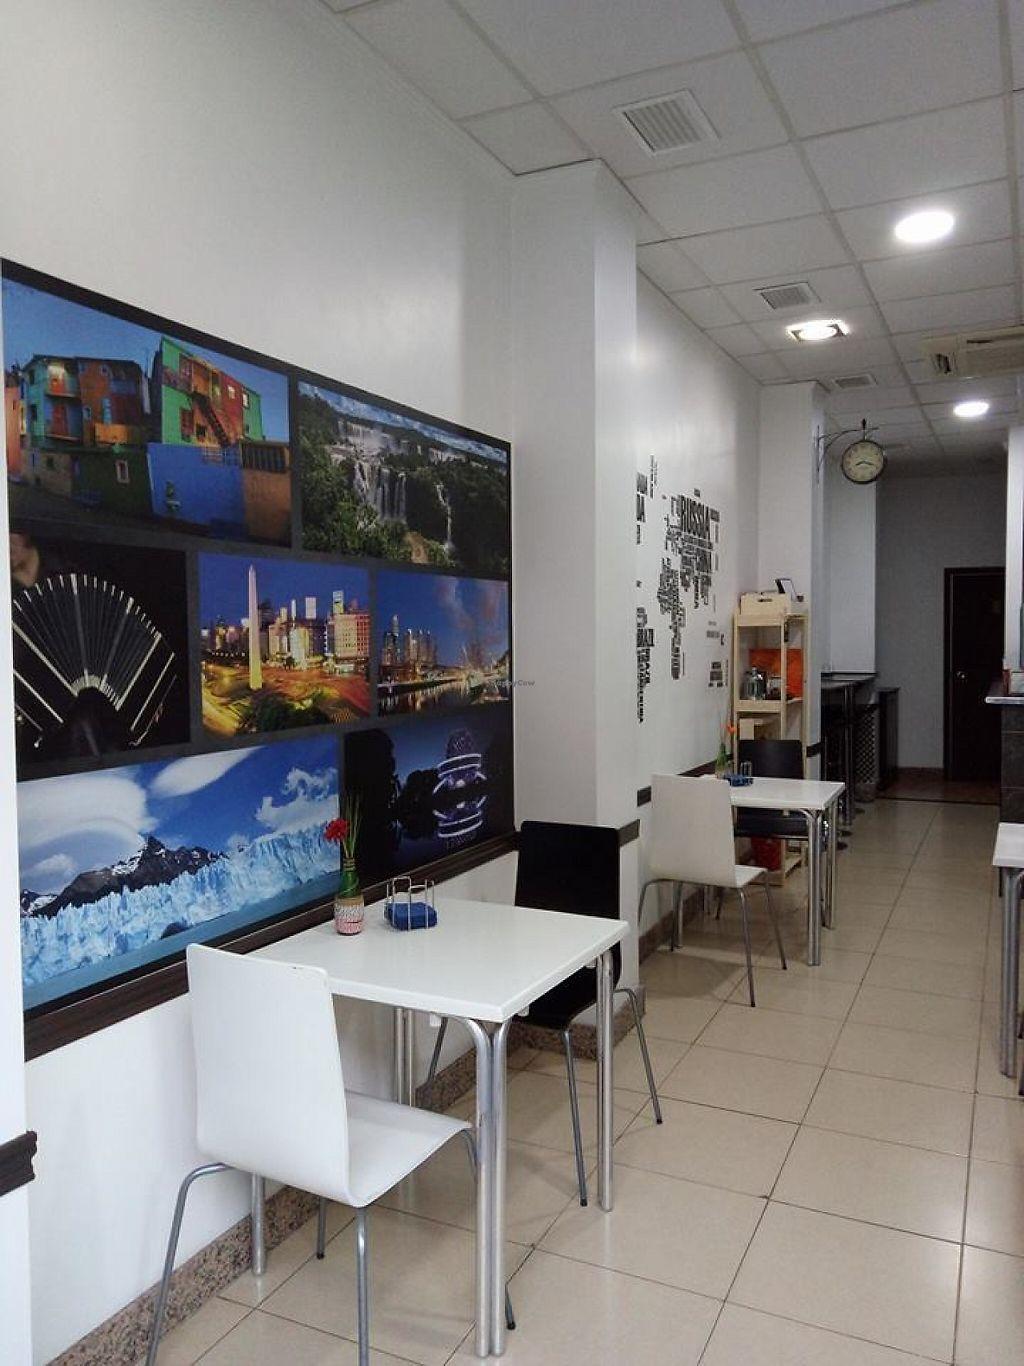 "Photo of Cafe Bar de las Artes - Argentino  by <a href=""/members/profile/community5"">community5</a> <br/>Cafe Bar de las Artes <br/> May 21, 2017  - <a href='/contact/abuse/image/92551/261165'>Report</a>"